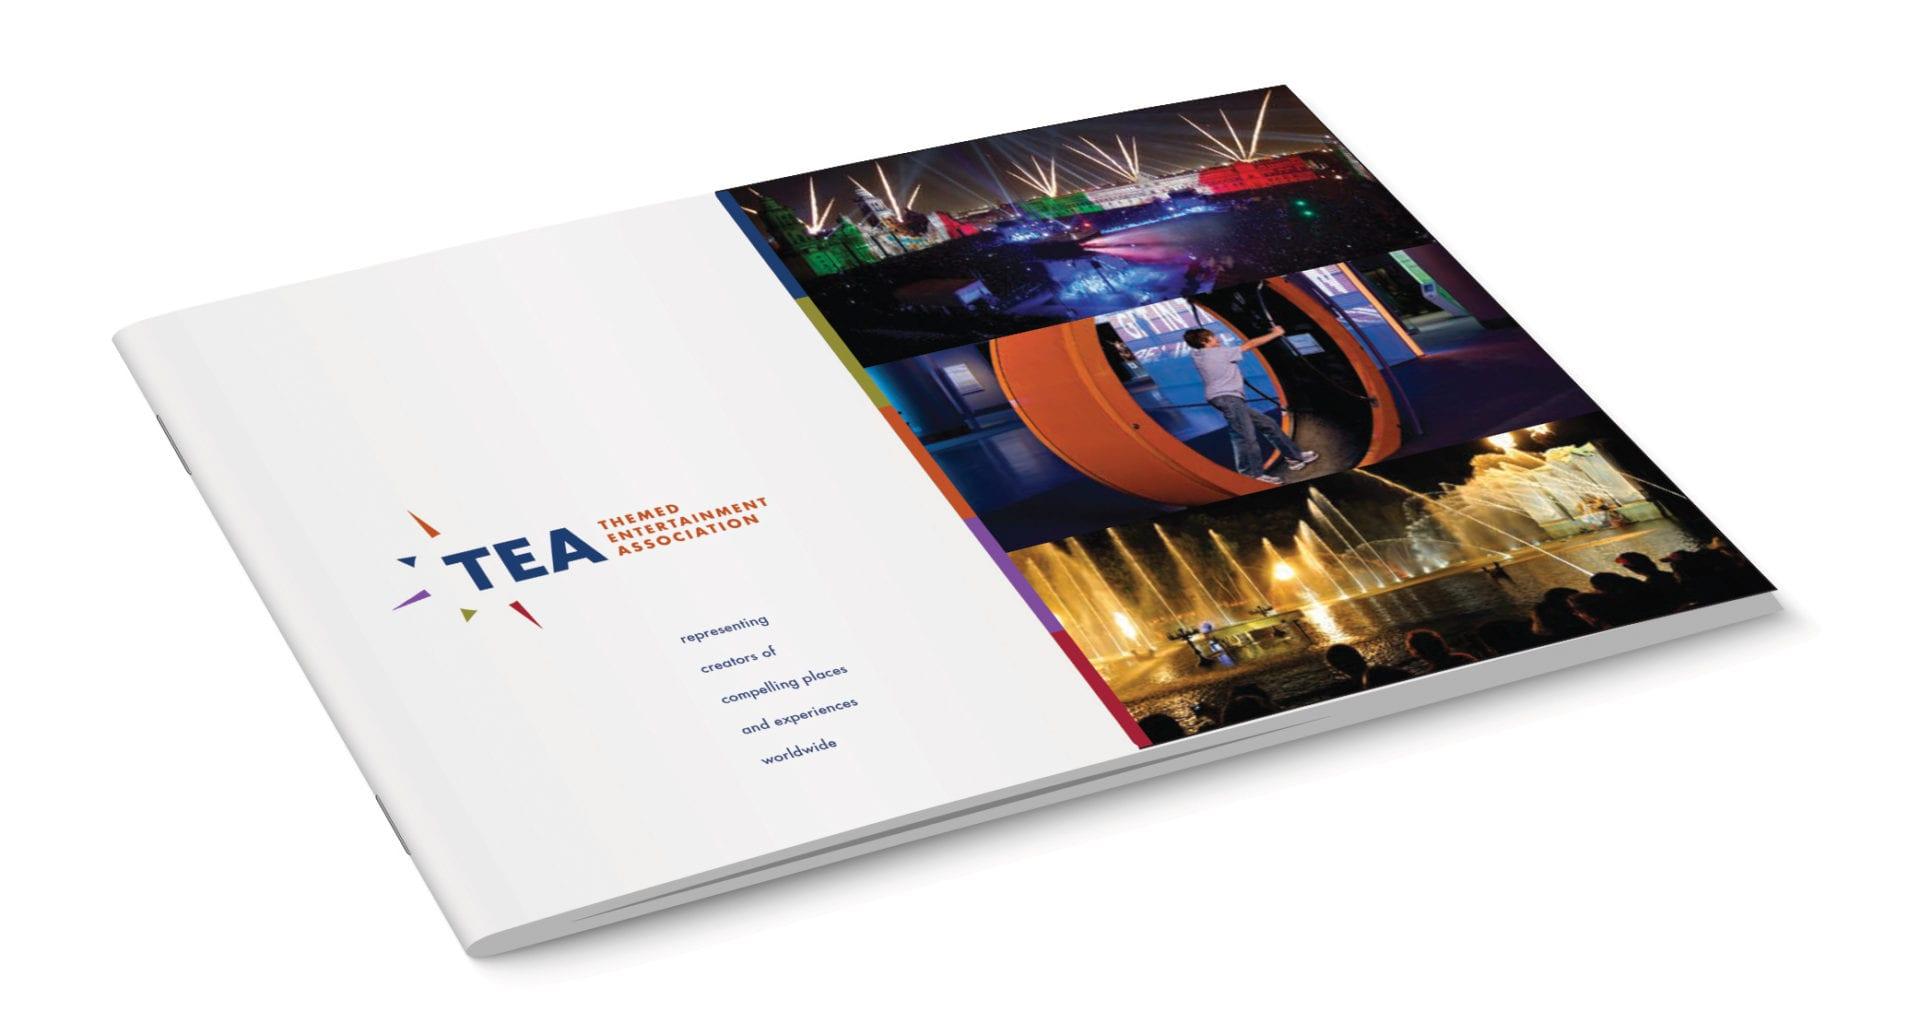 The Themed Entertainment Association brochure